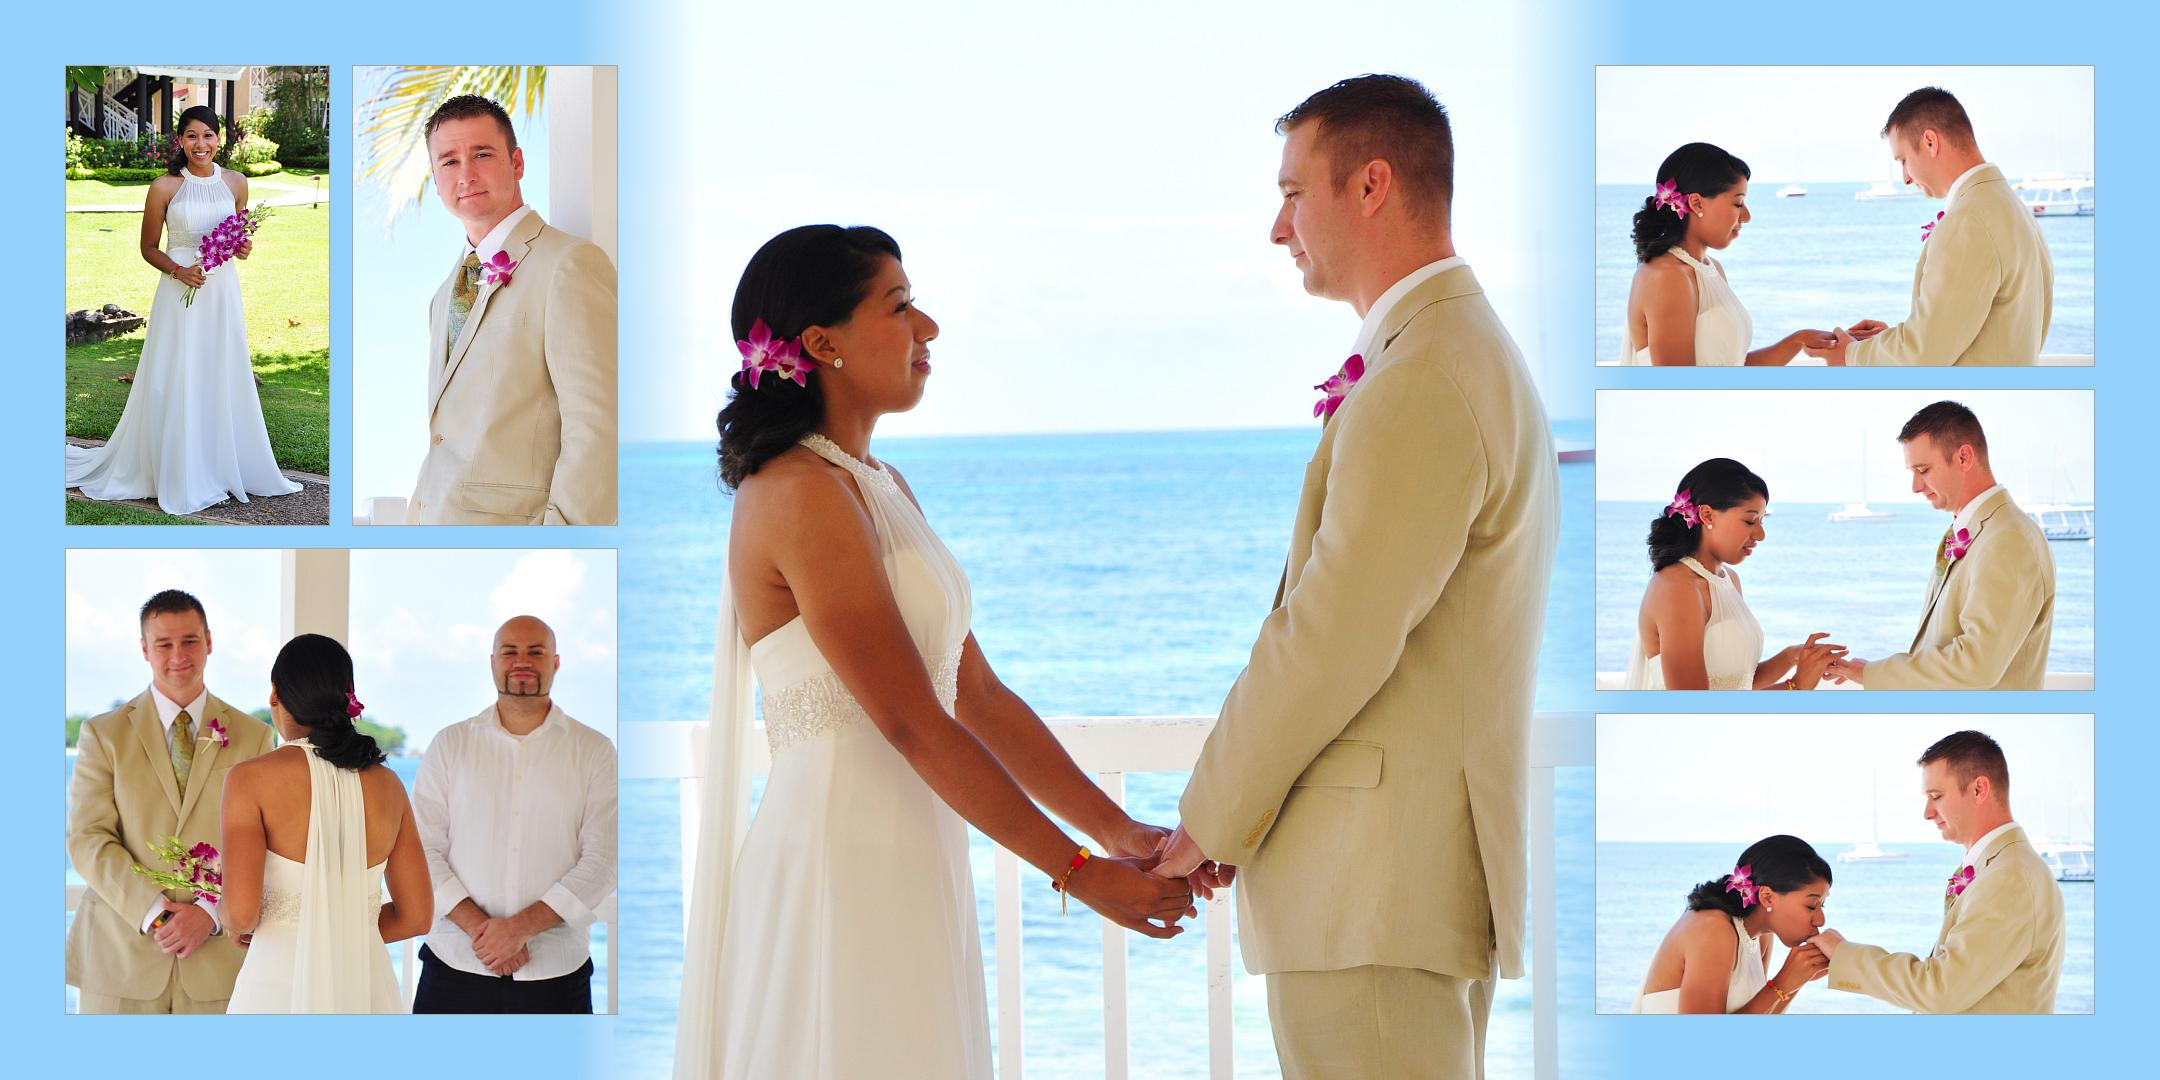 Wedding Photos by Tom Schmidt Chicago (41)